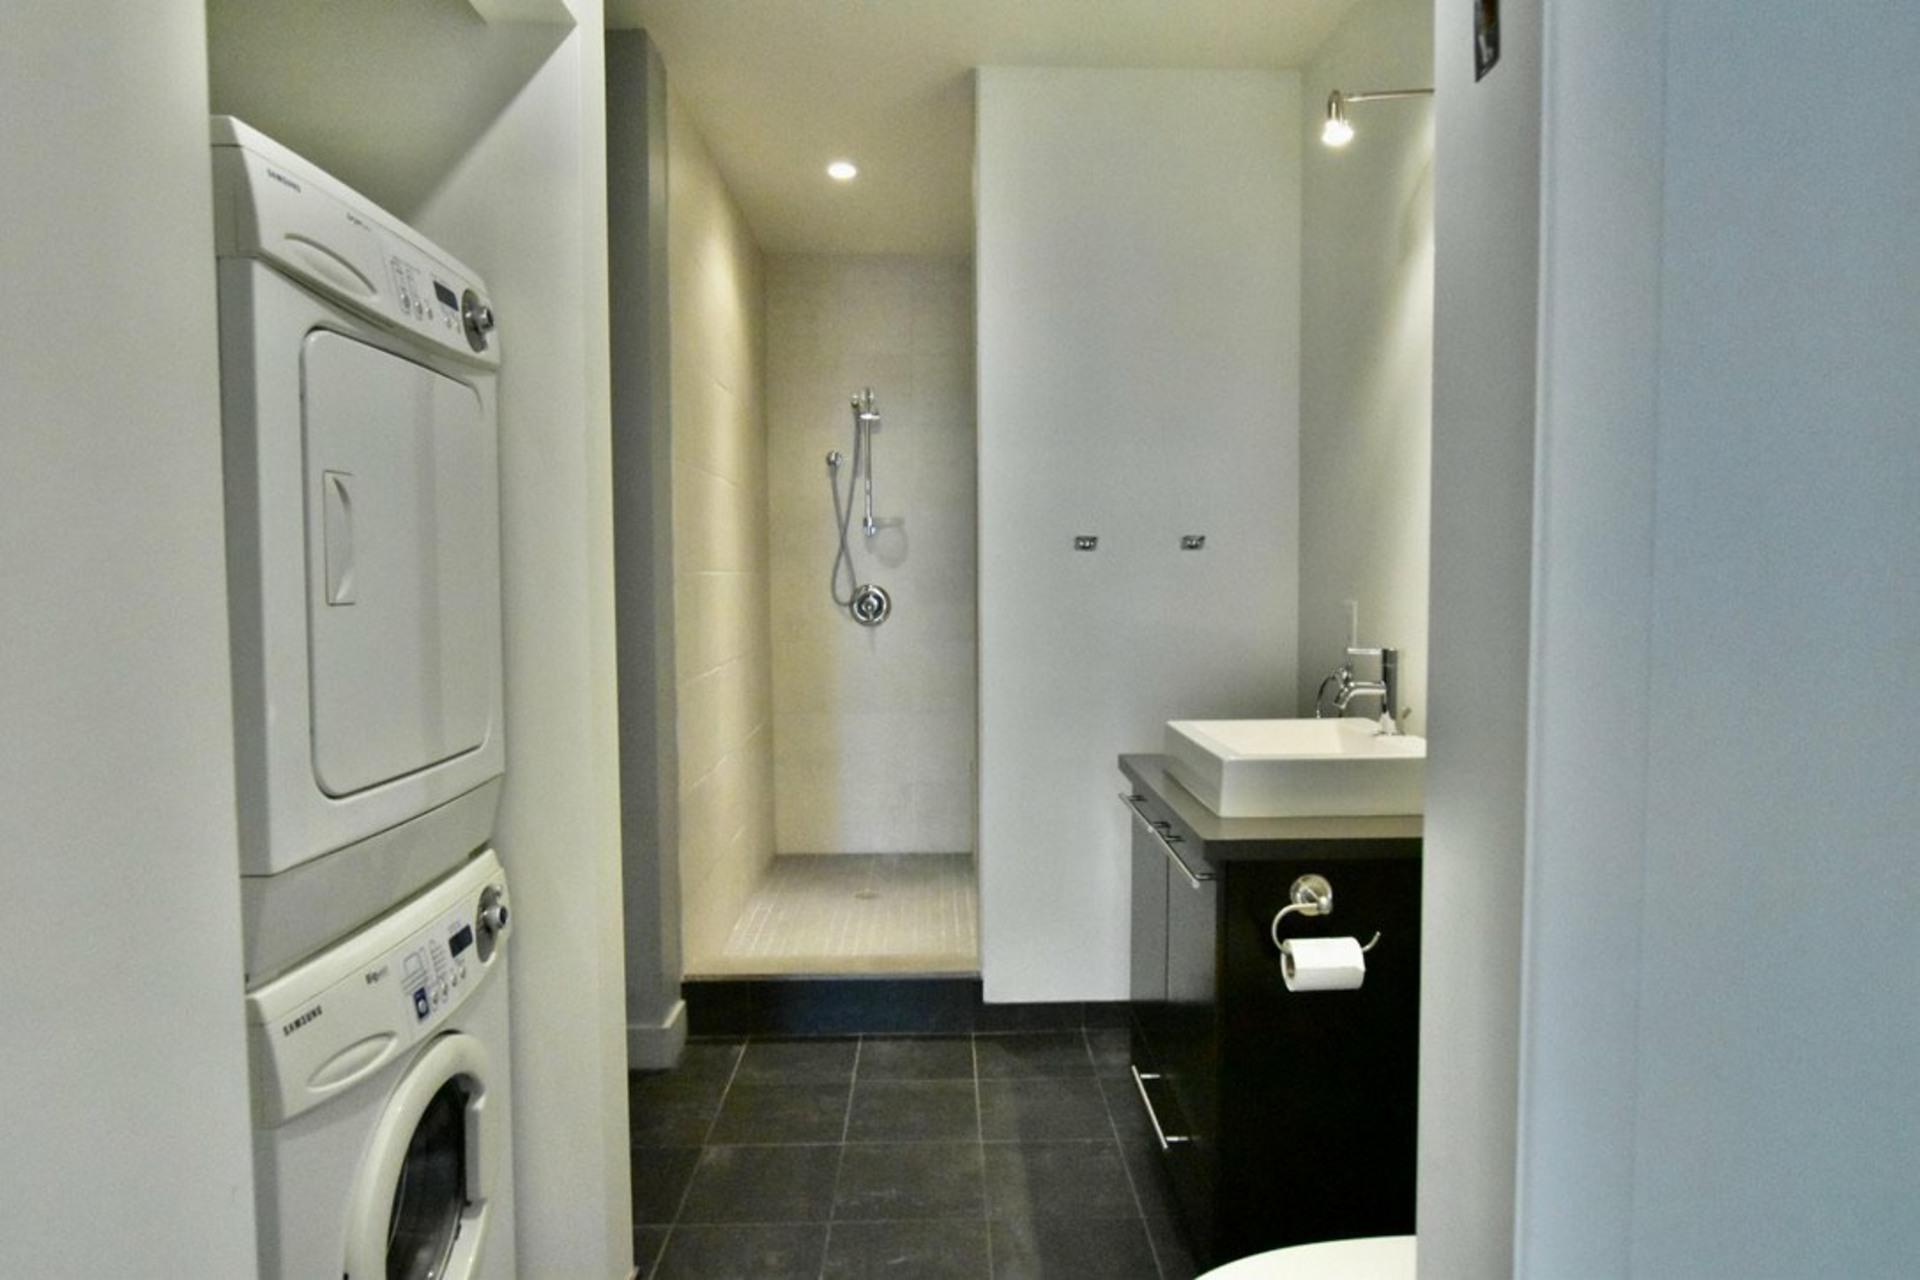 image 24 - Departamento Para alquiler Villeray/Saint-Michel/Parc-Extension Montréal  - 3 habitaciones